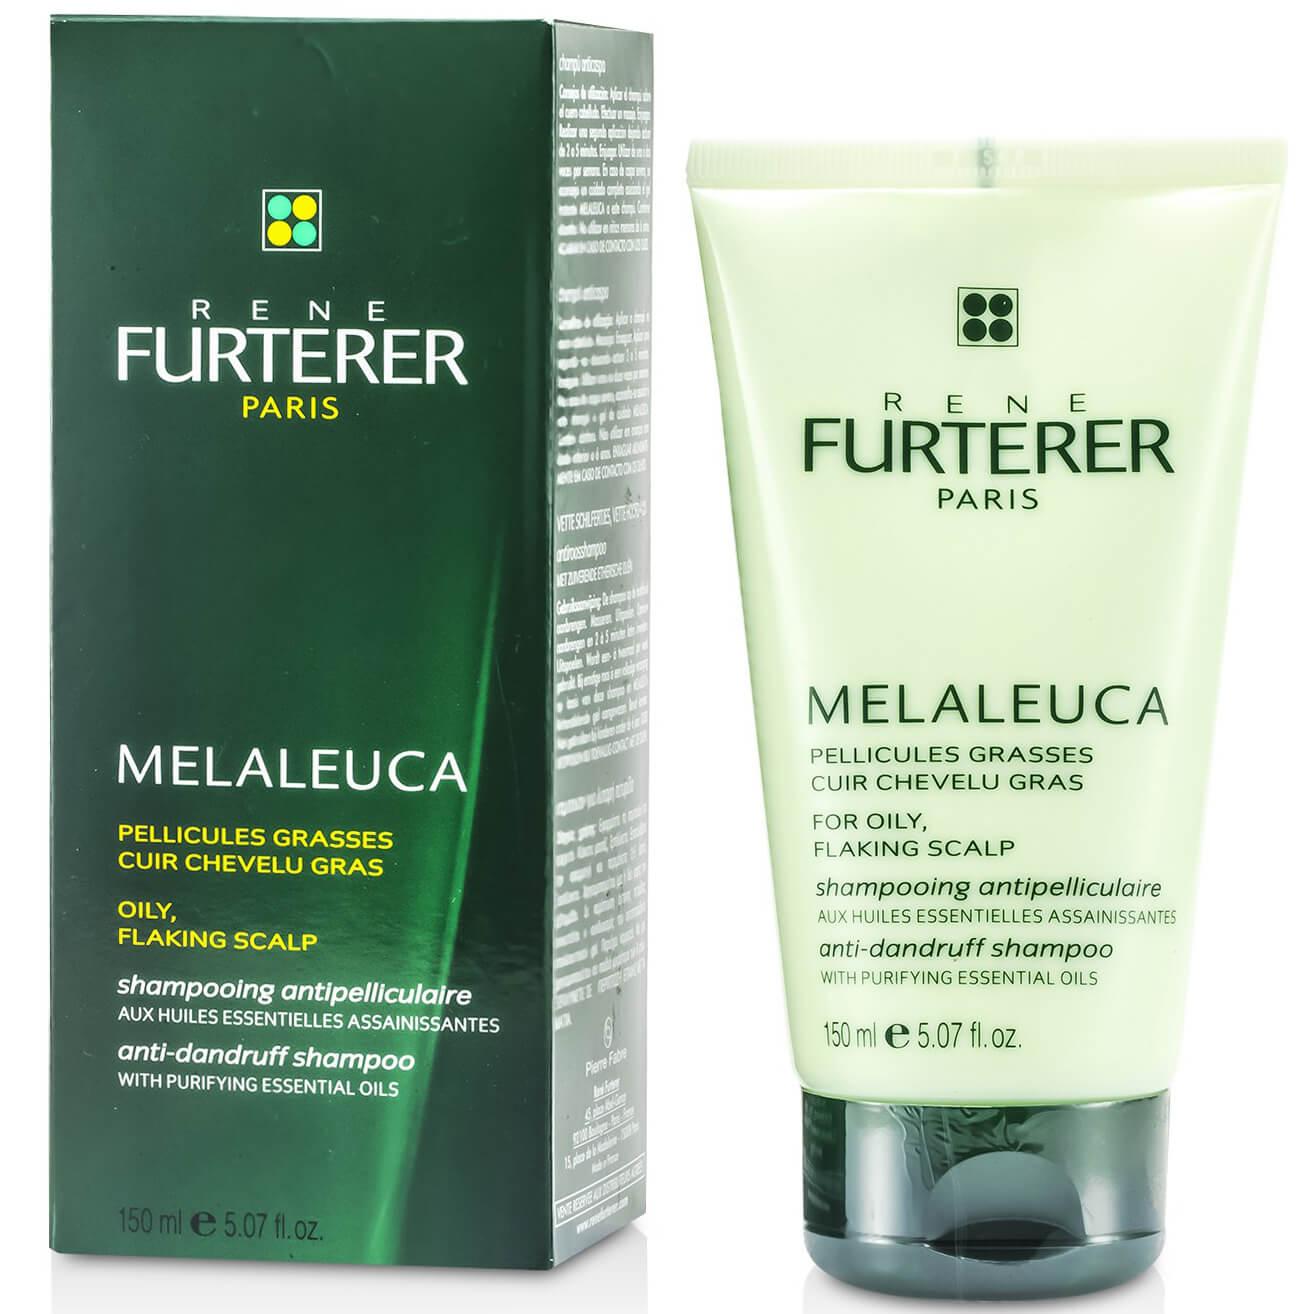 Rene Furterer Melaleuca Shampoo Pellic.Grasses Σαμπουάν Κατά της Λιπαρής Πιτυρίδας 150ml